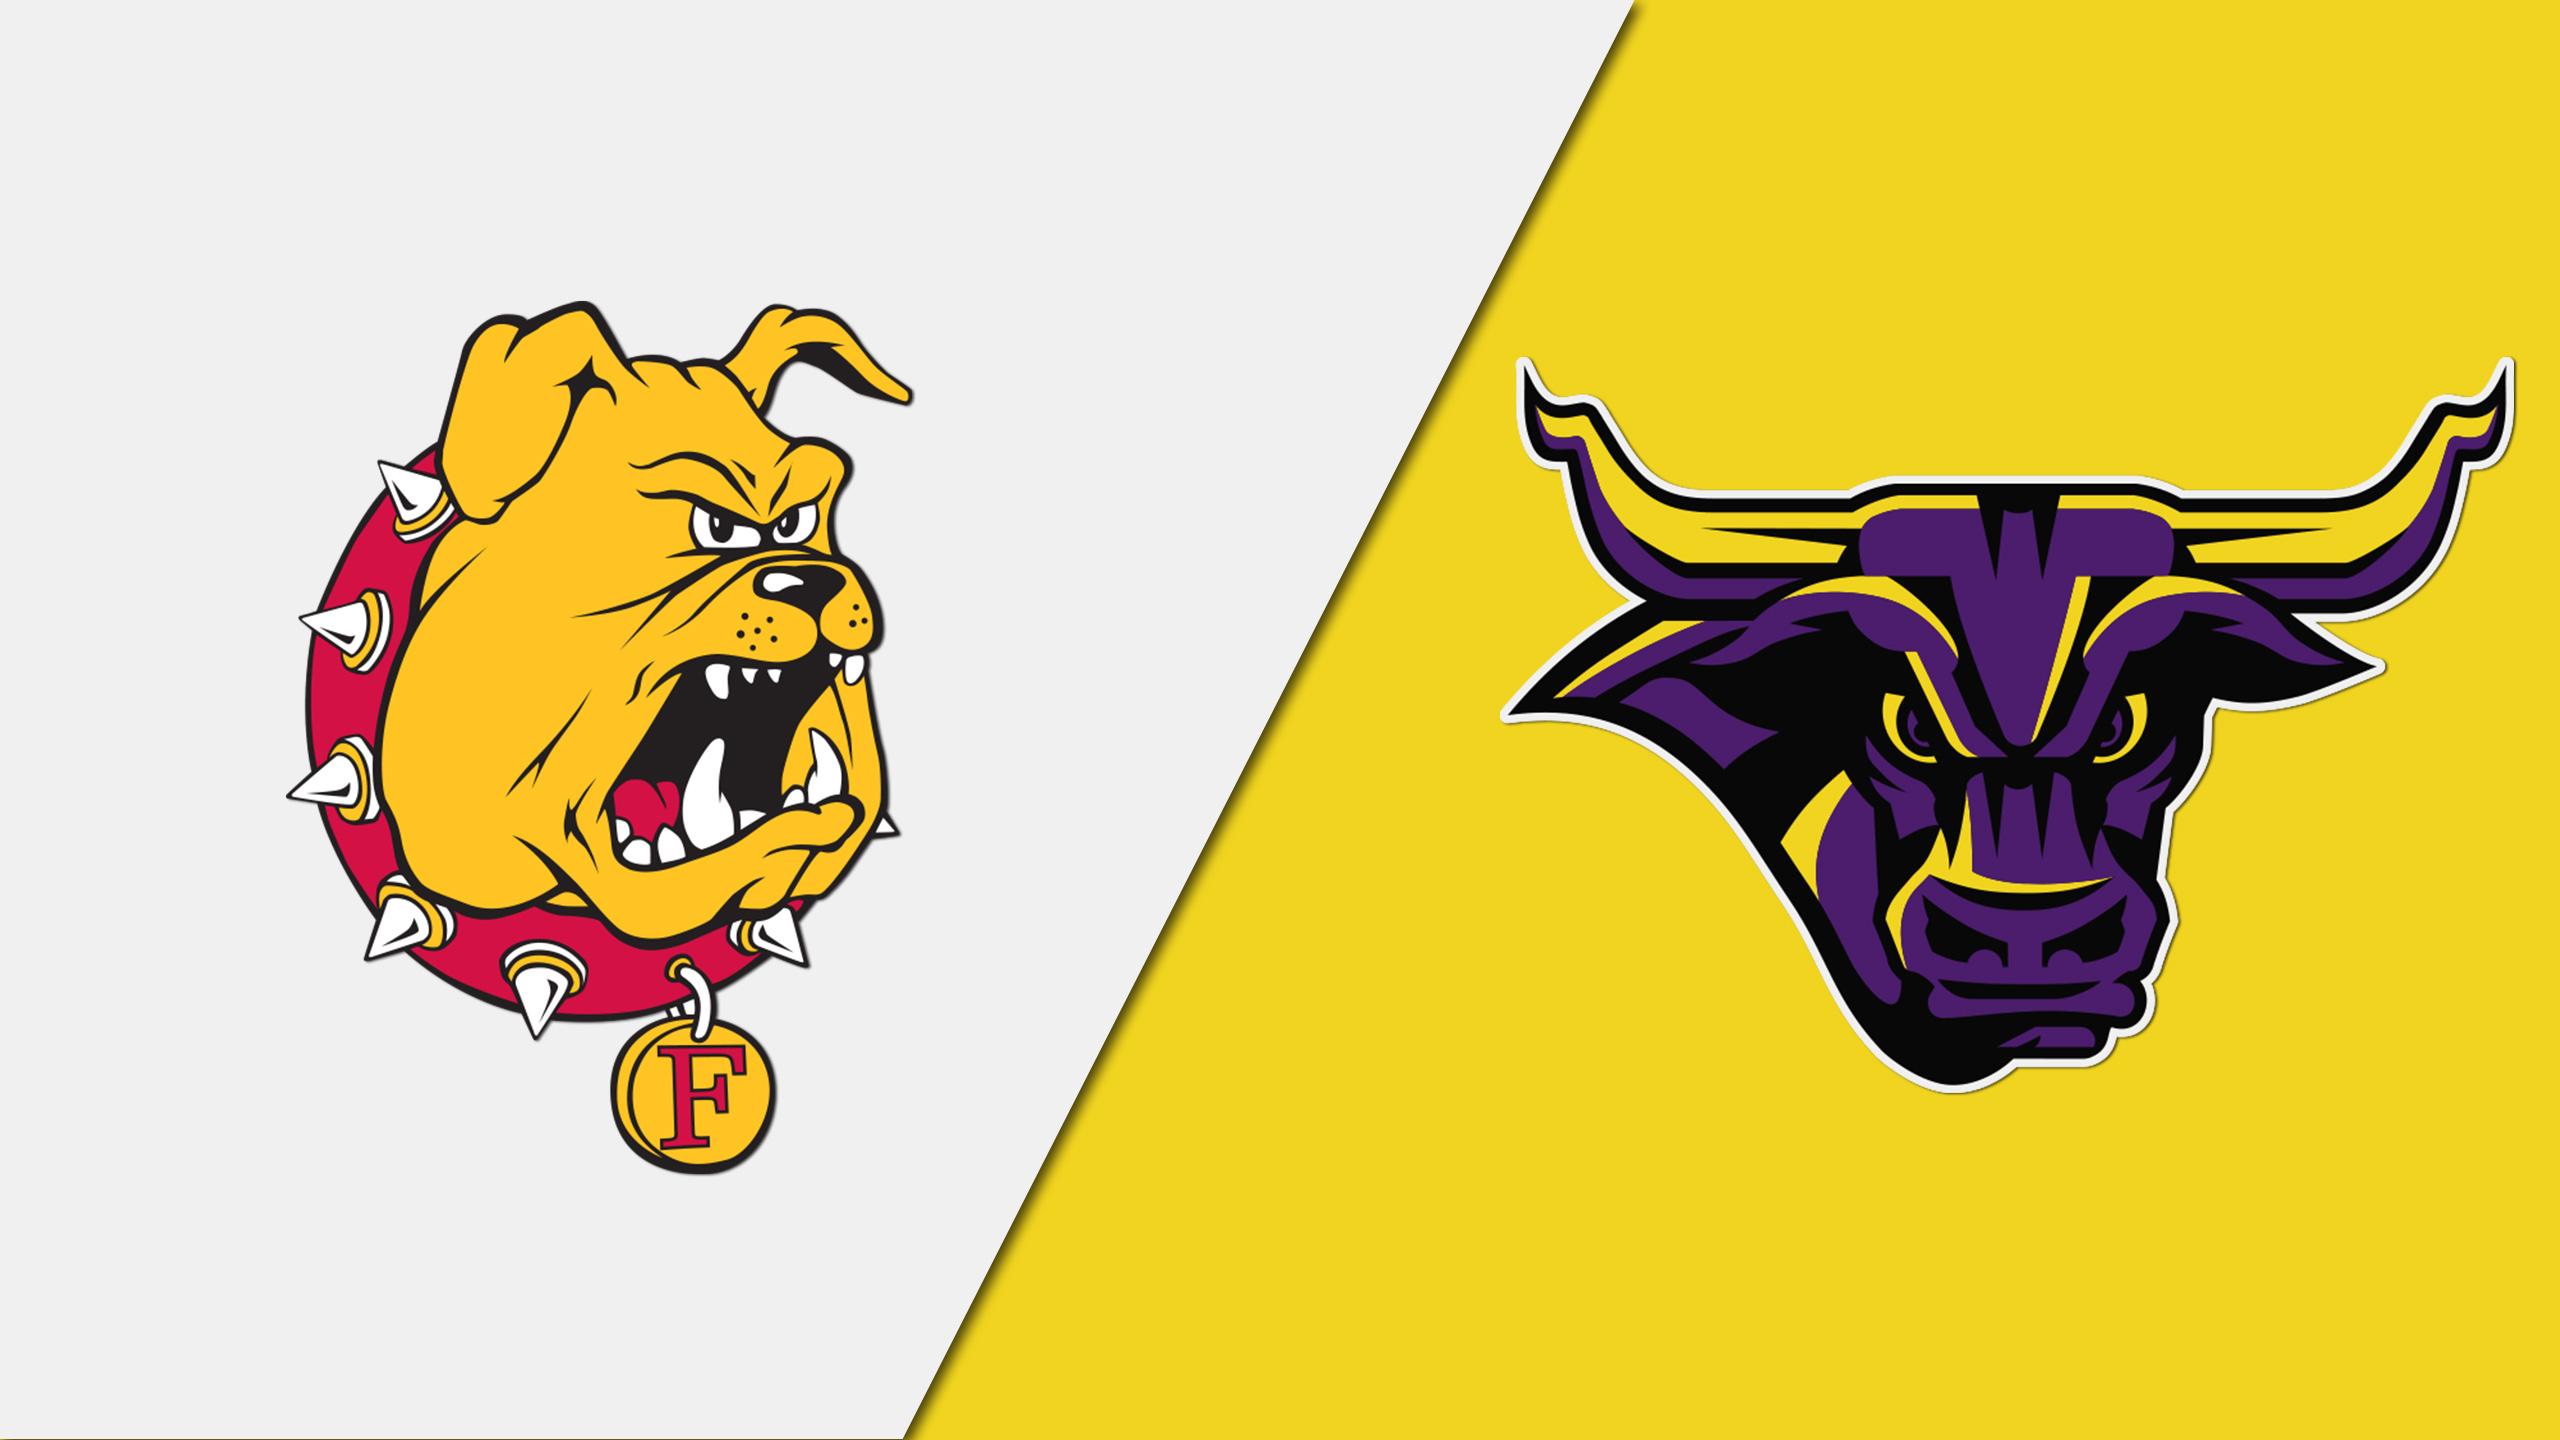 Ferris State (MI) vs. Minnesota State Mankato (Semifinal #2) (NCAA Division II Football Championship)